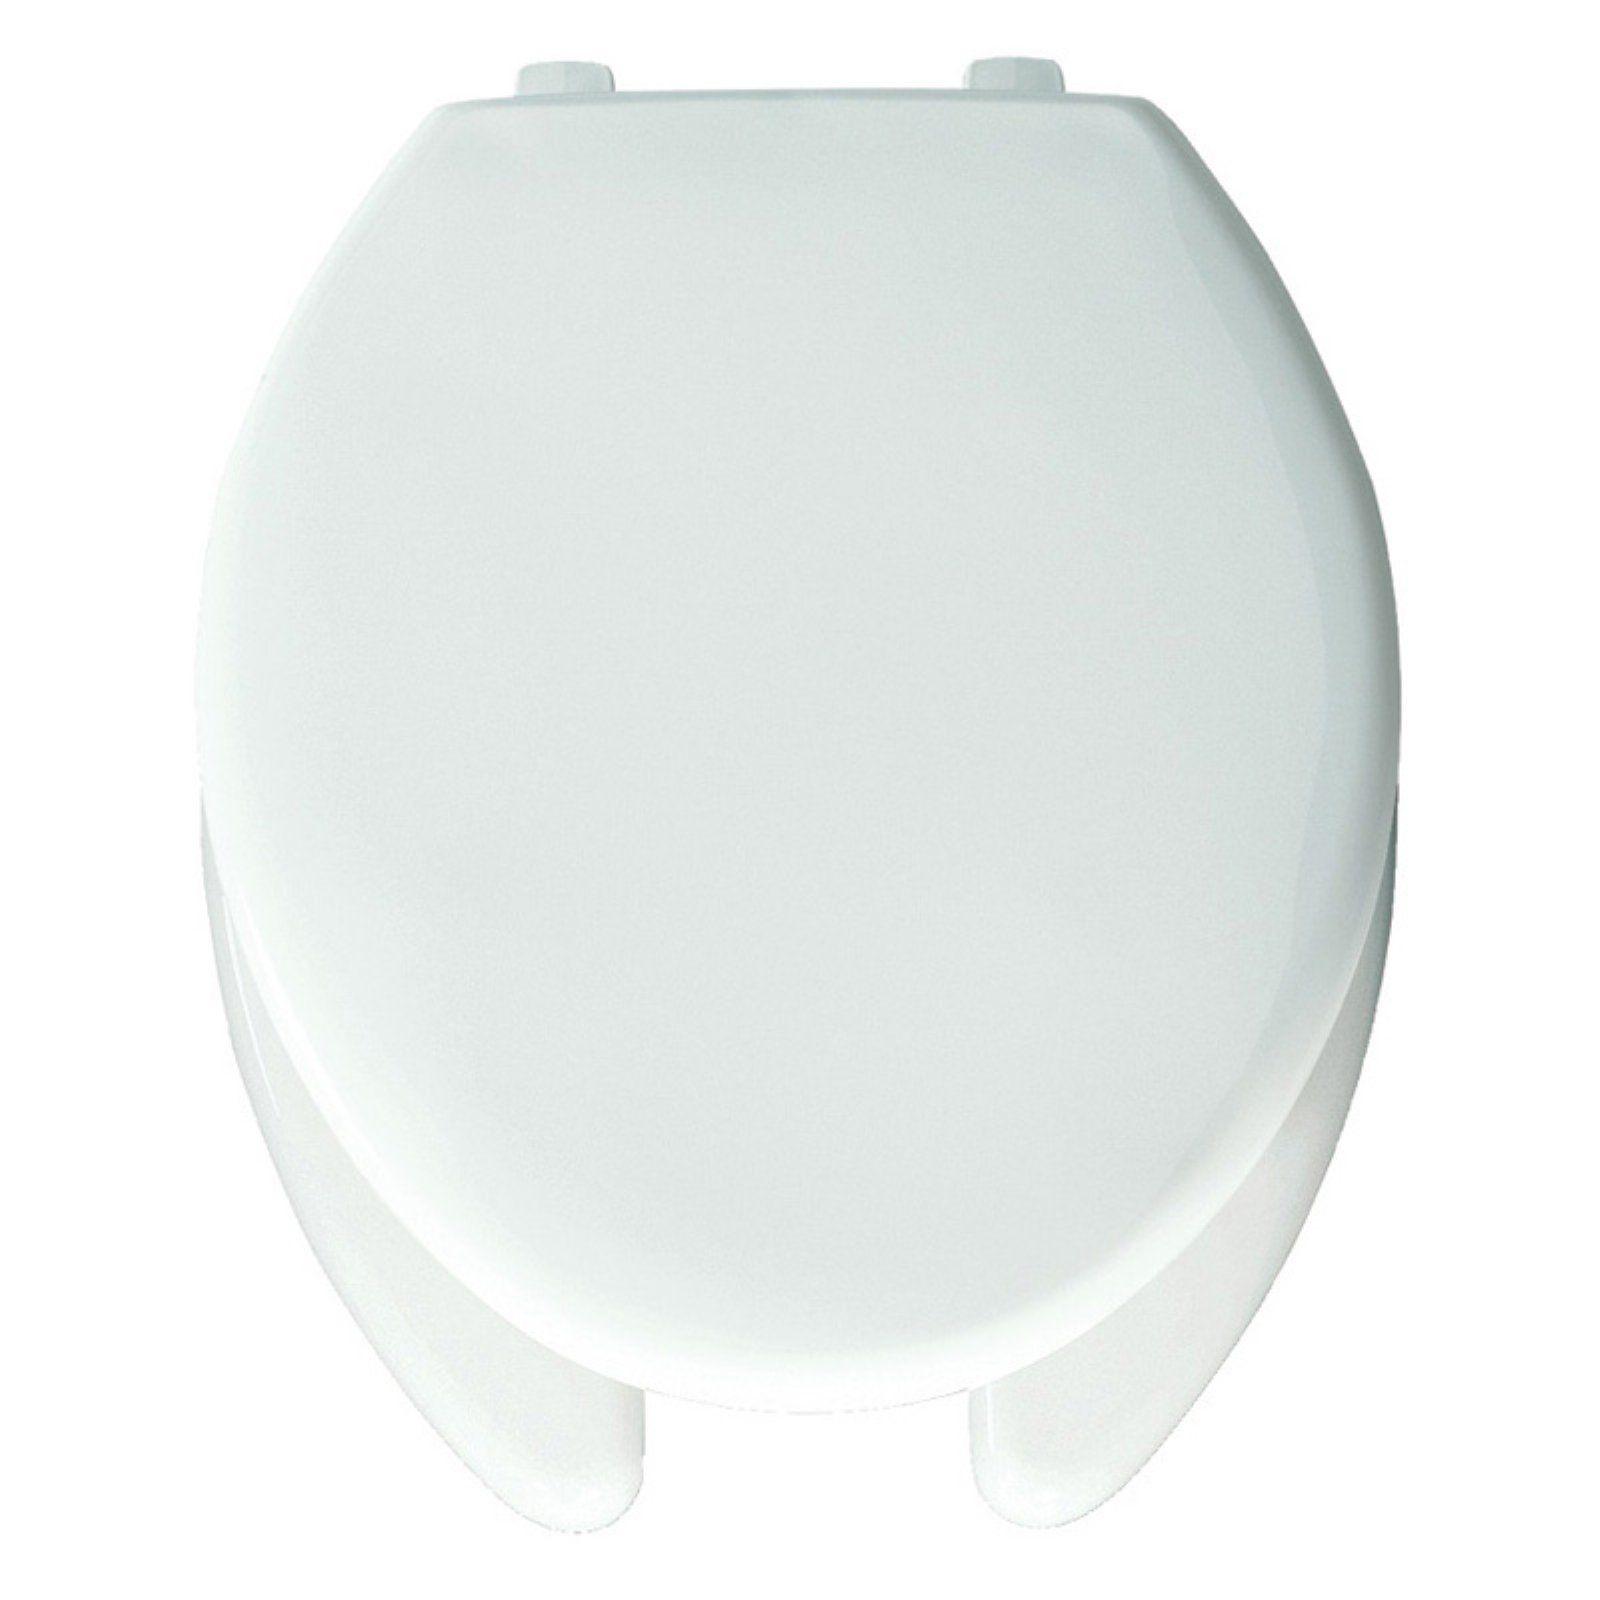 Astounding Bemis 1950 Elongated White Commercial Toilet Seat In 2019 Dailytribune Chair Design For Home Dailytribuneorg